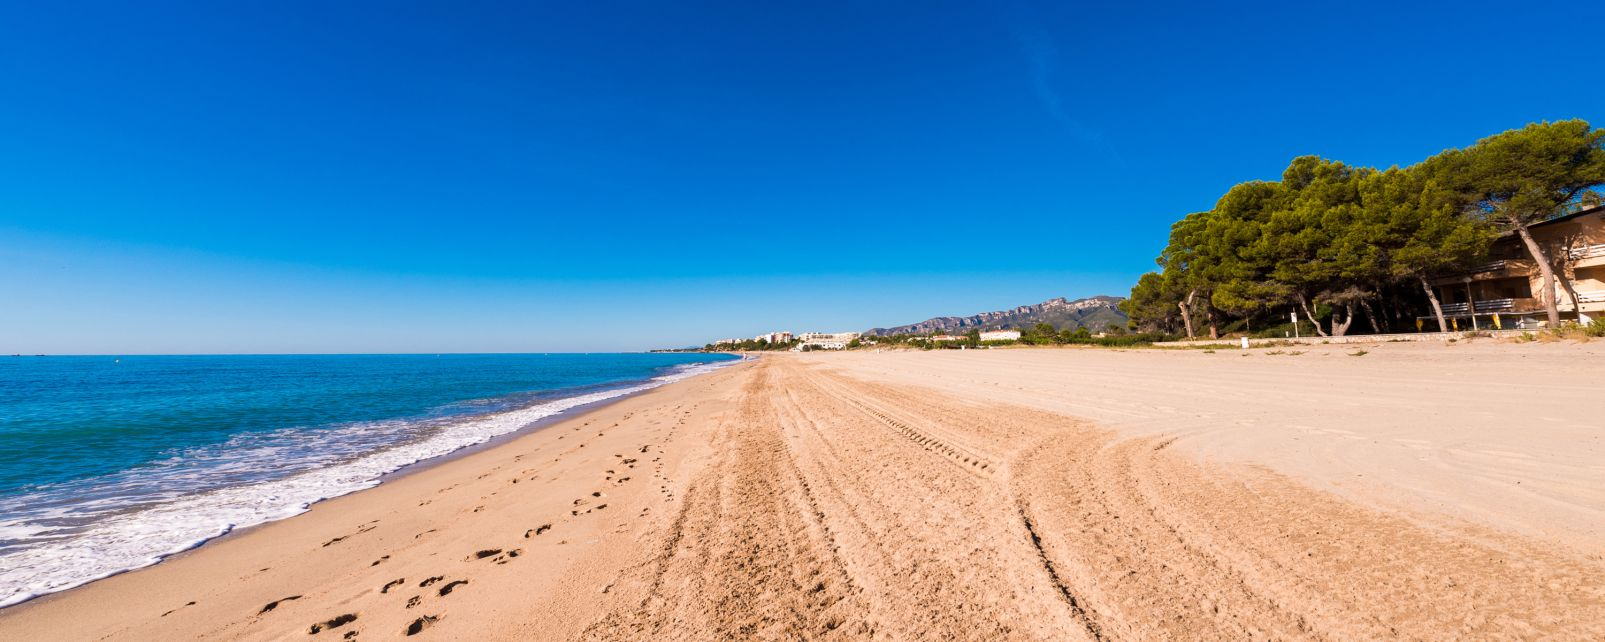 The Costa Dorada, Costa Dorada, Coasts, Catalonia